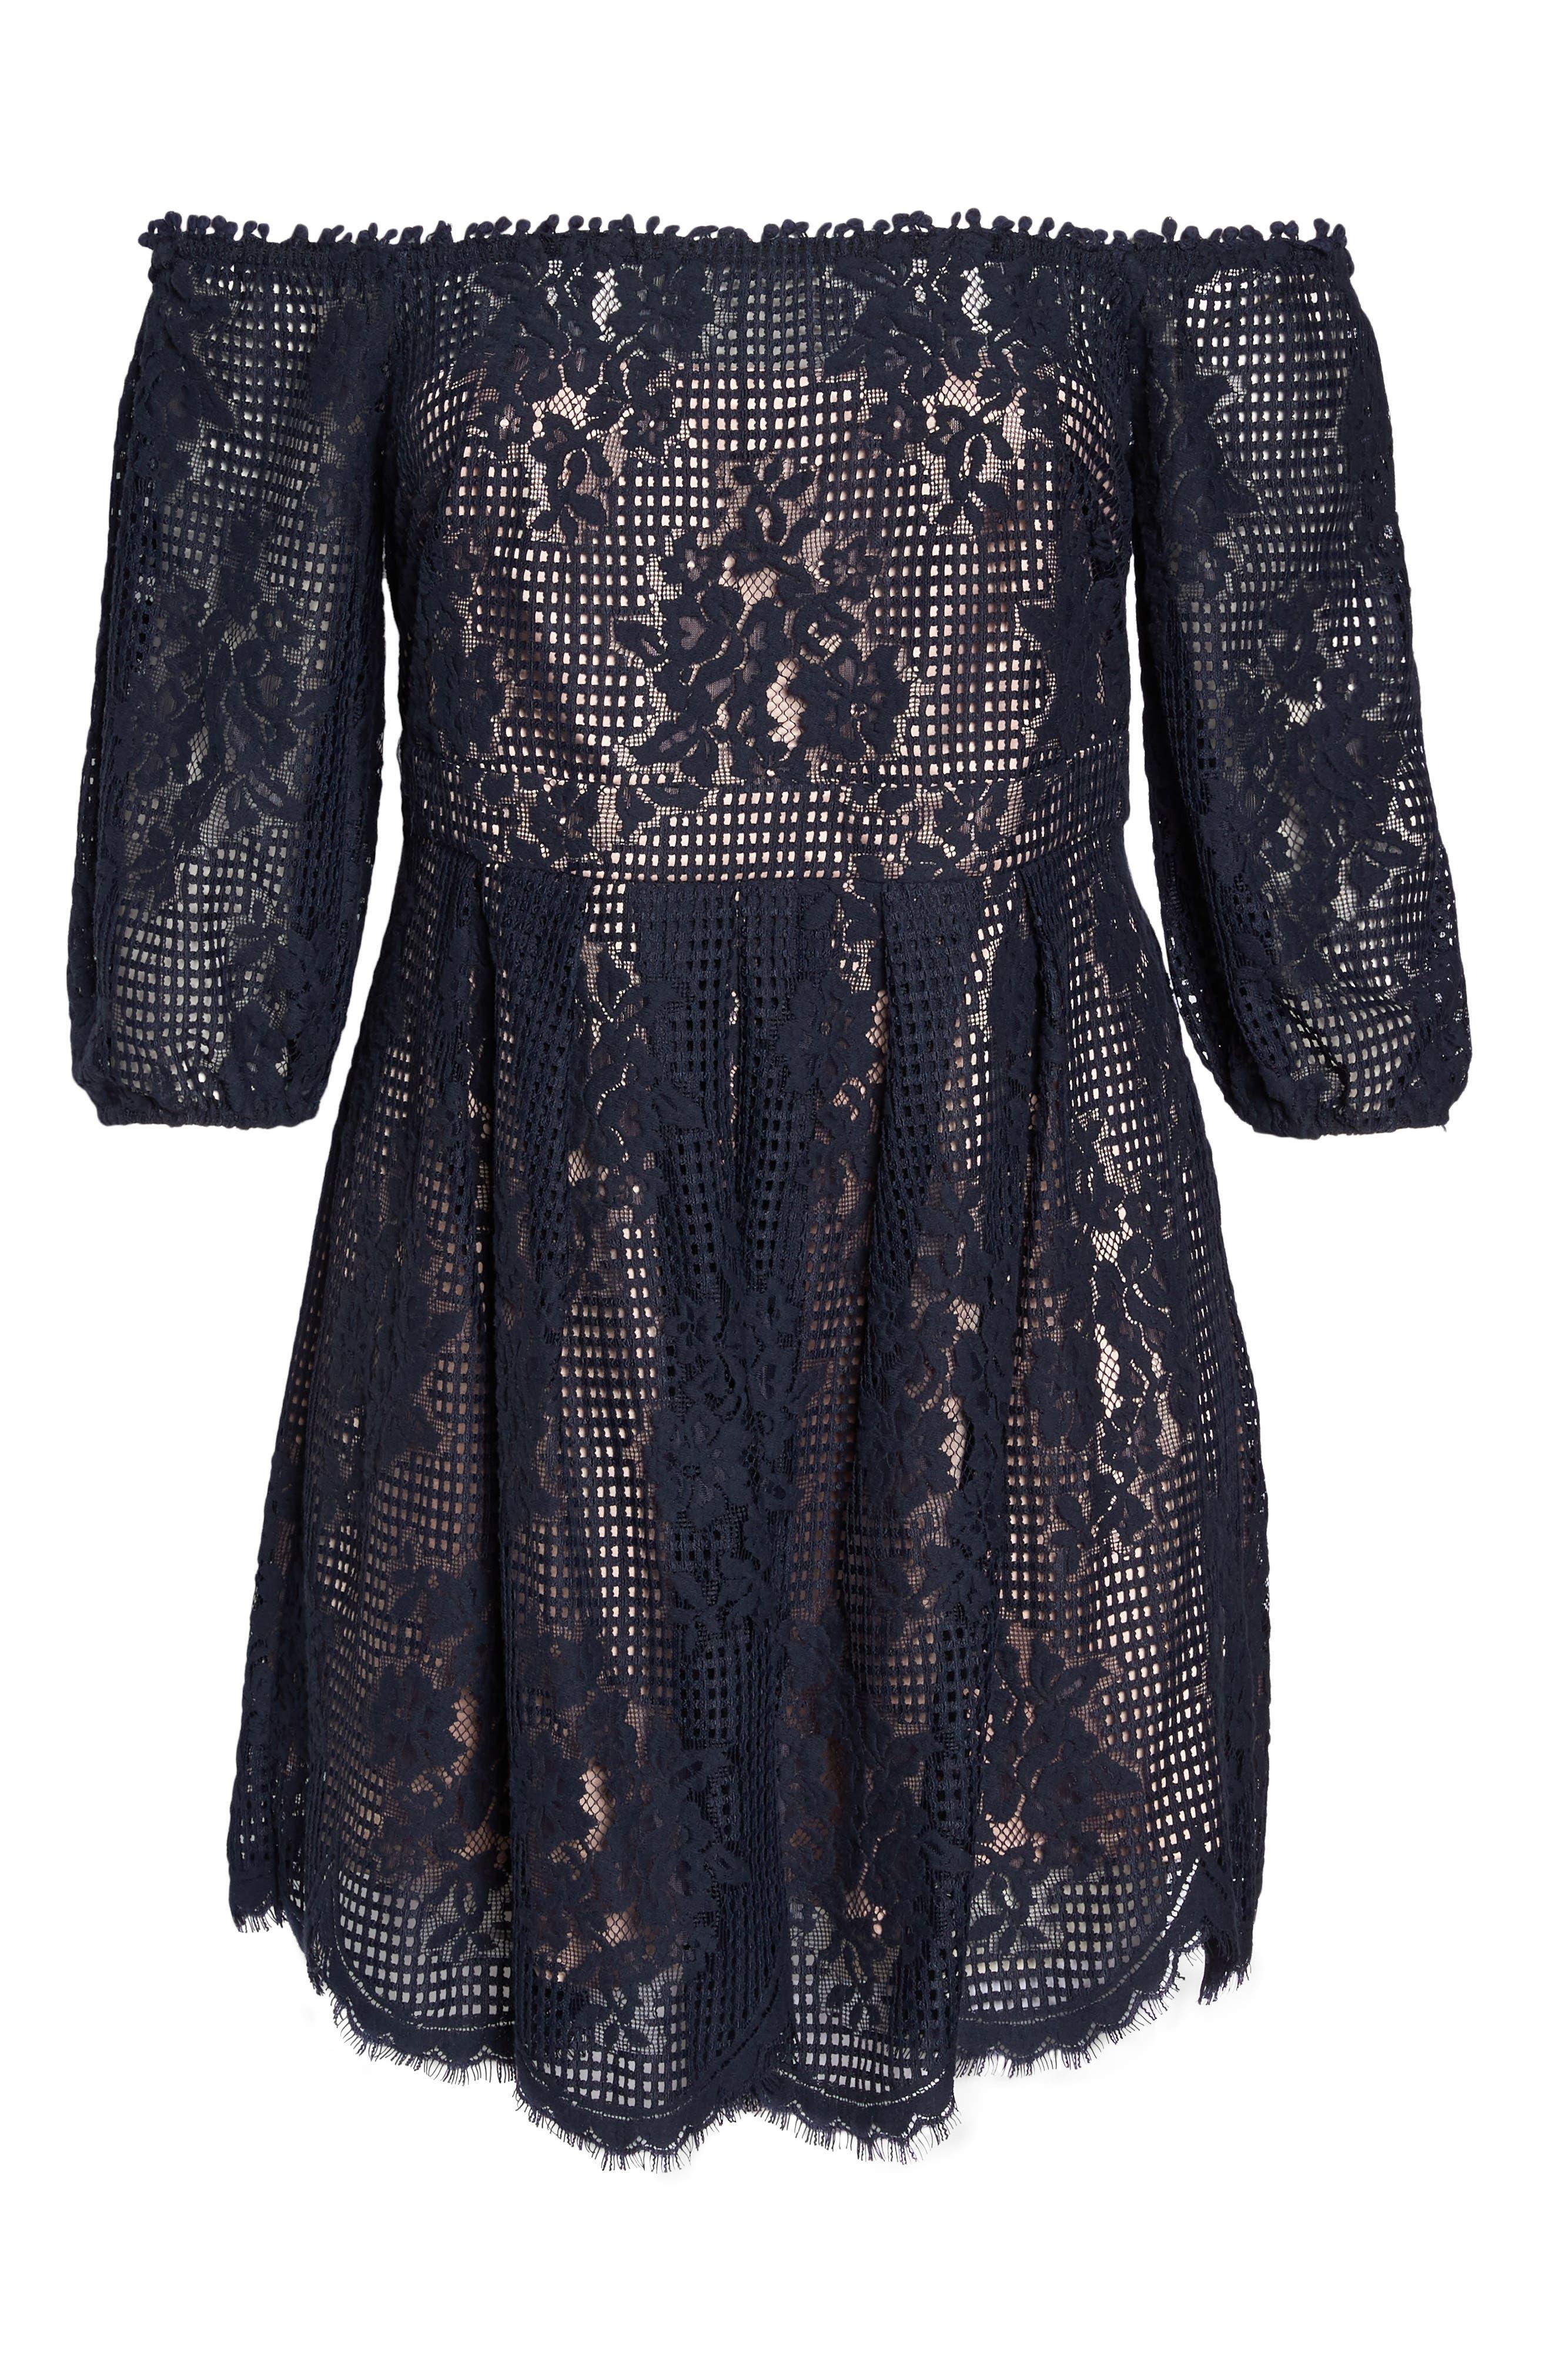 Floral Lace Off the Shoulder Dress,                             Alternate thumbnail 6, color,                             410